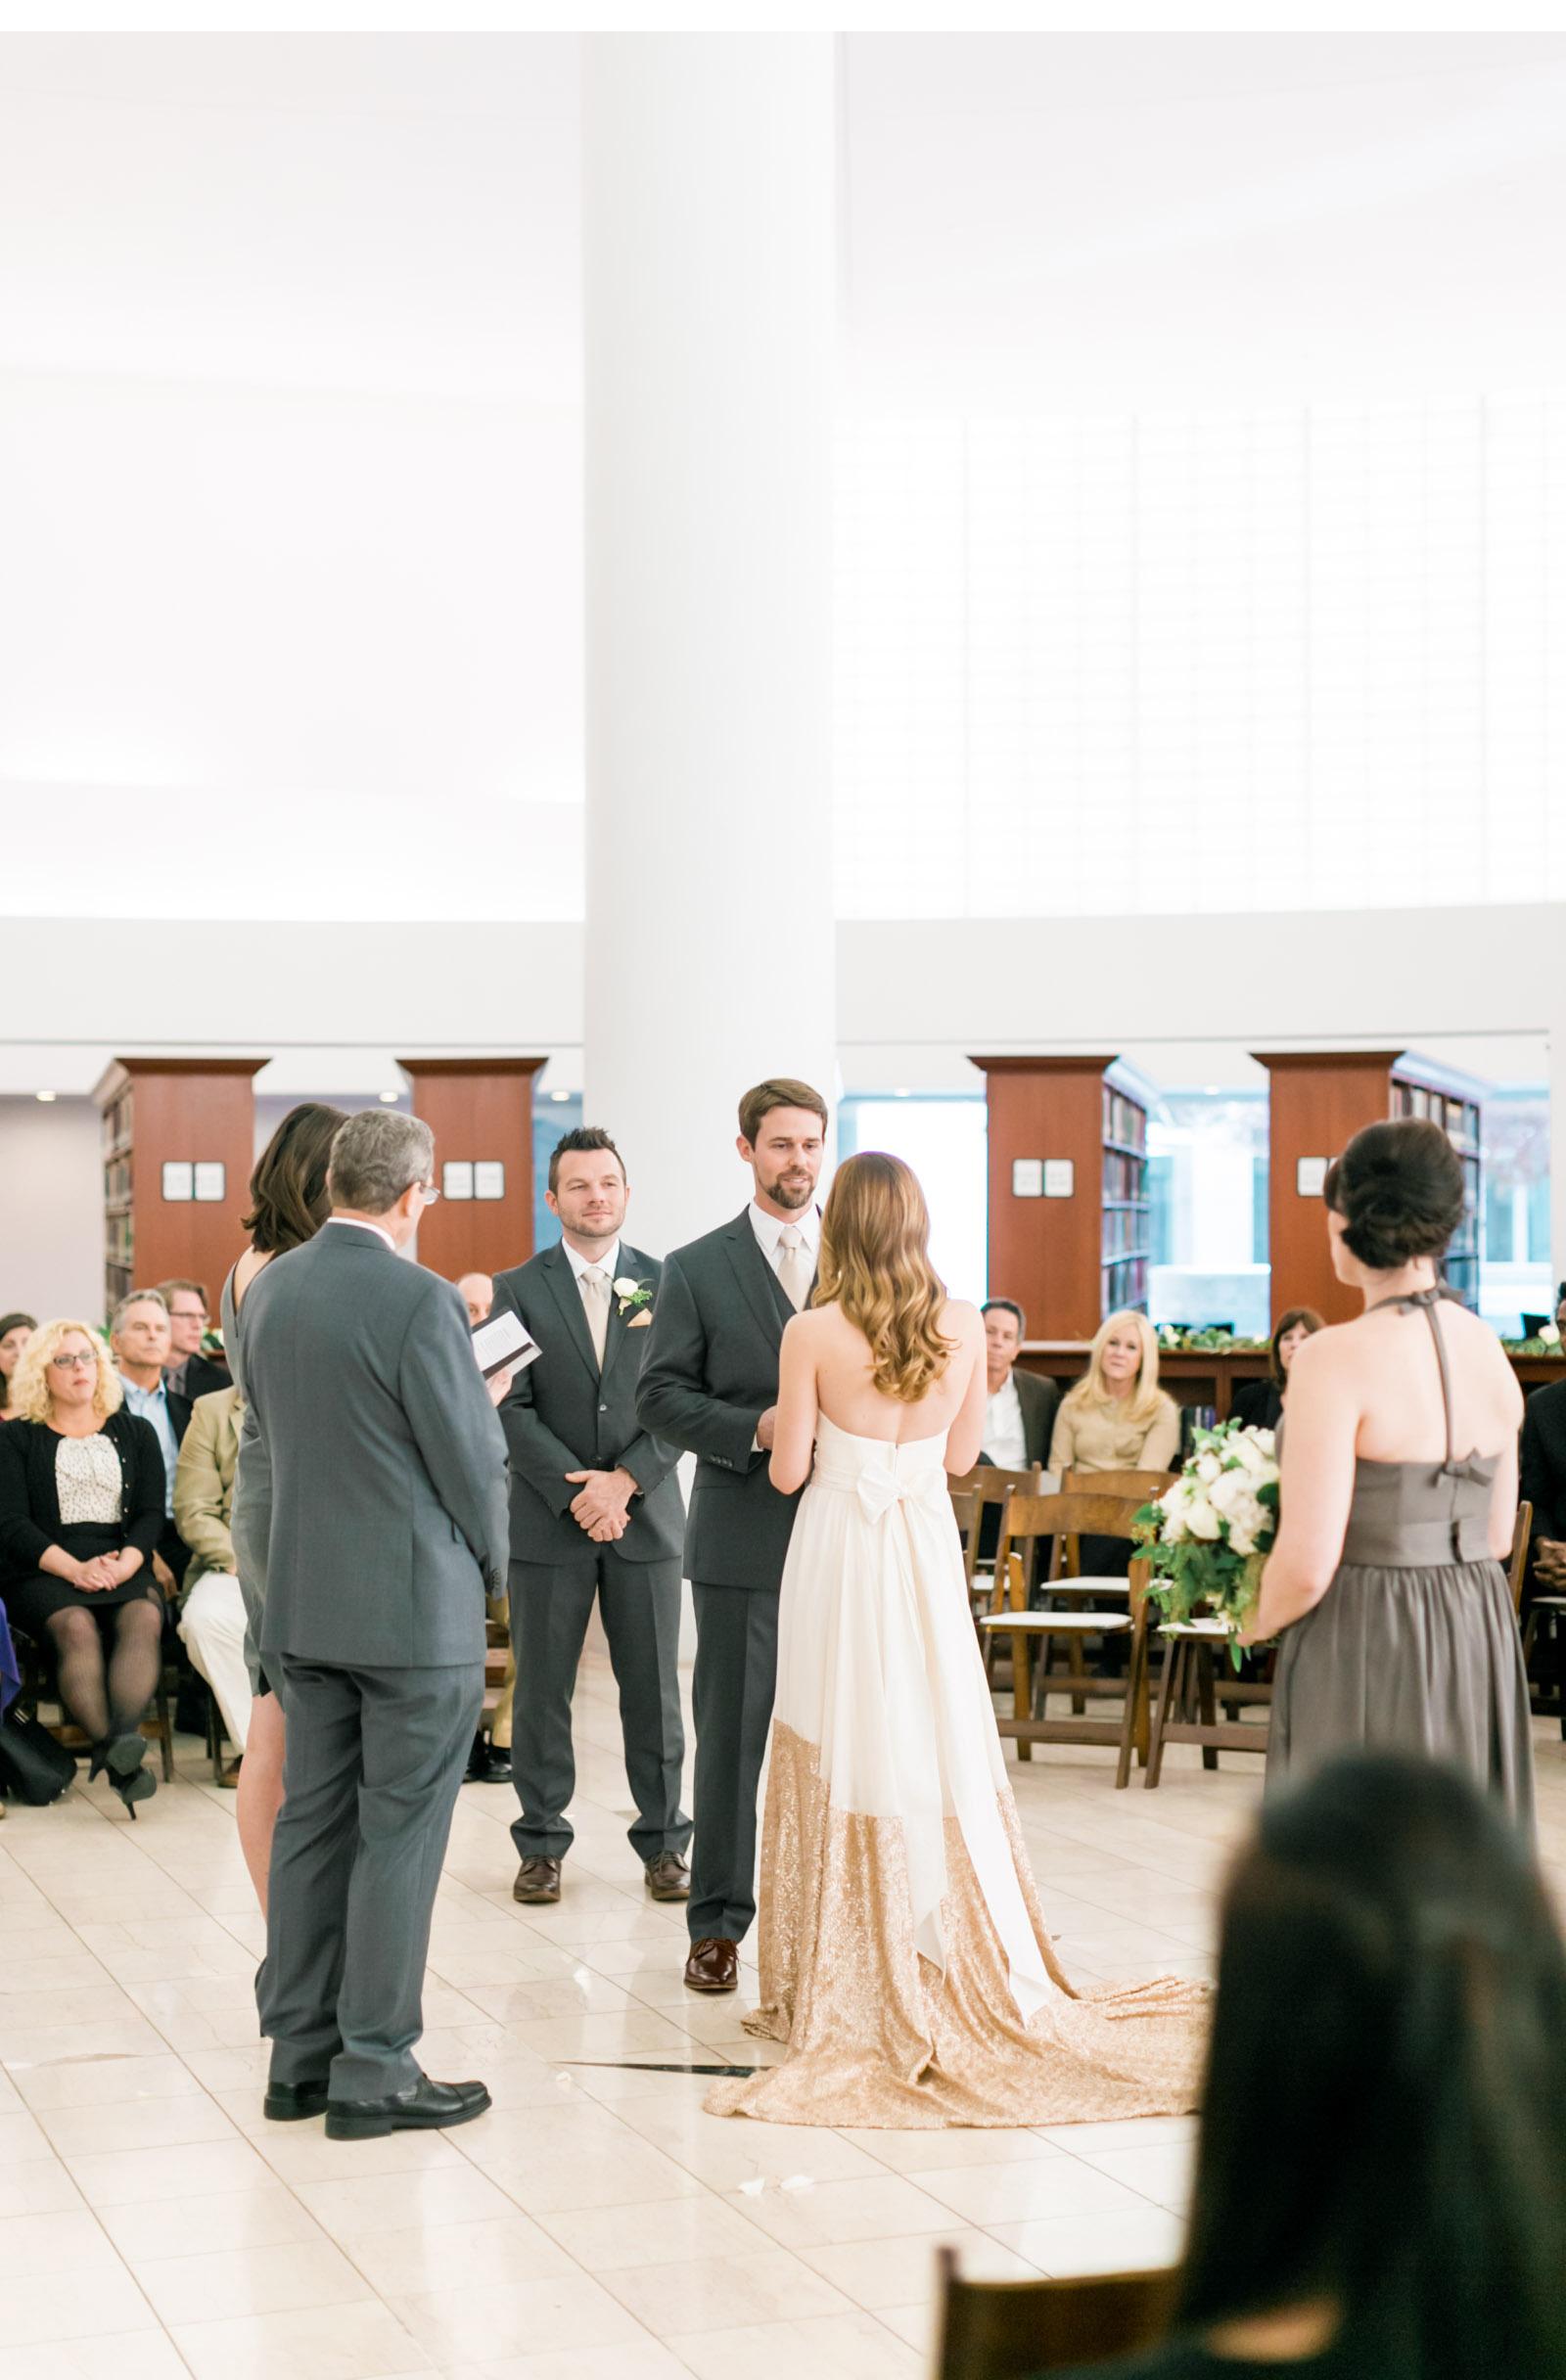 Orange-County-Wedding-Photography-Natalie-Schutt-Photography_01.jpg